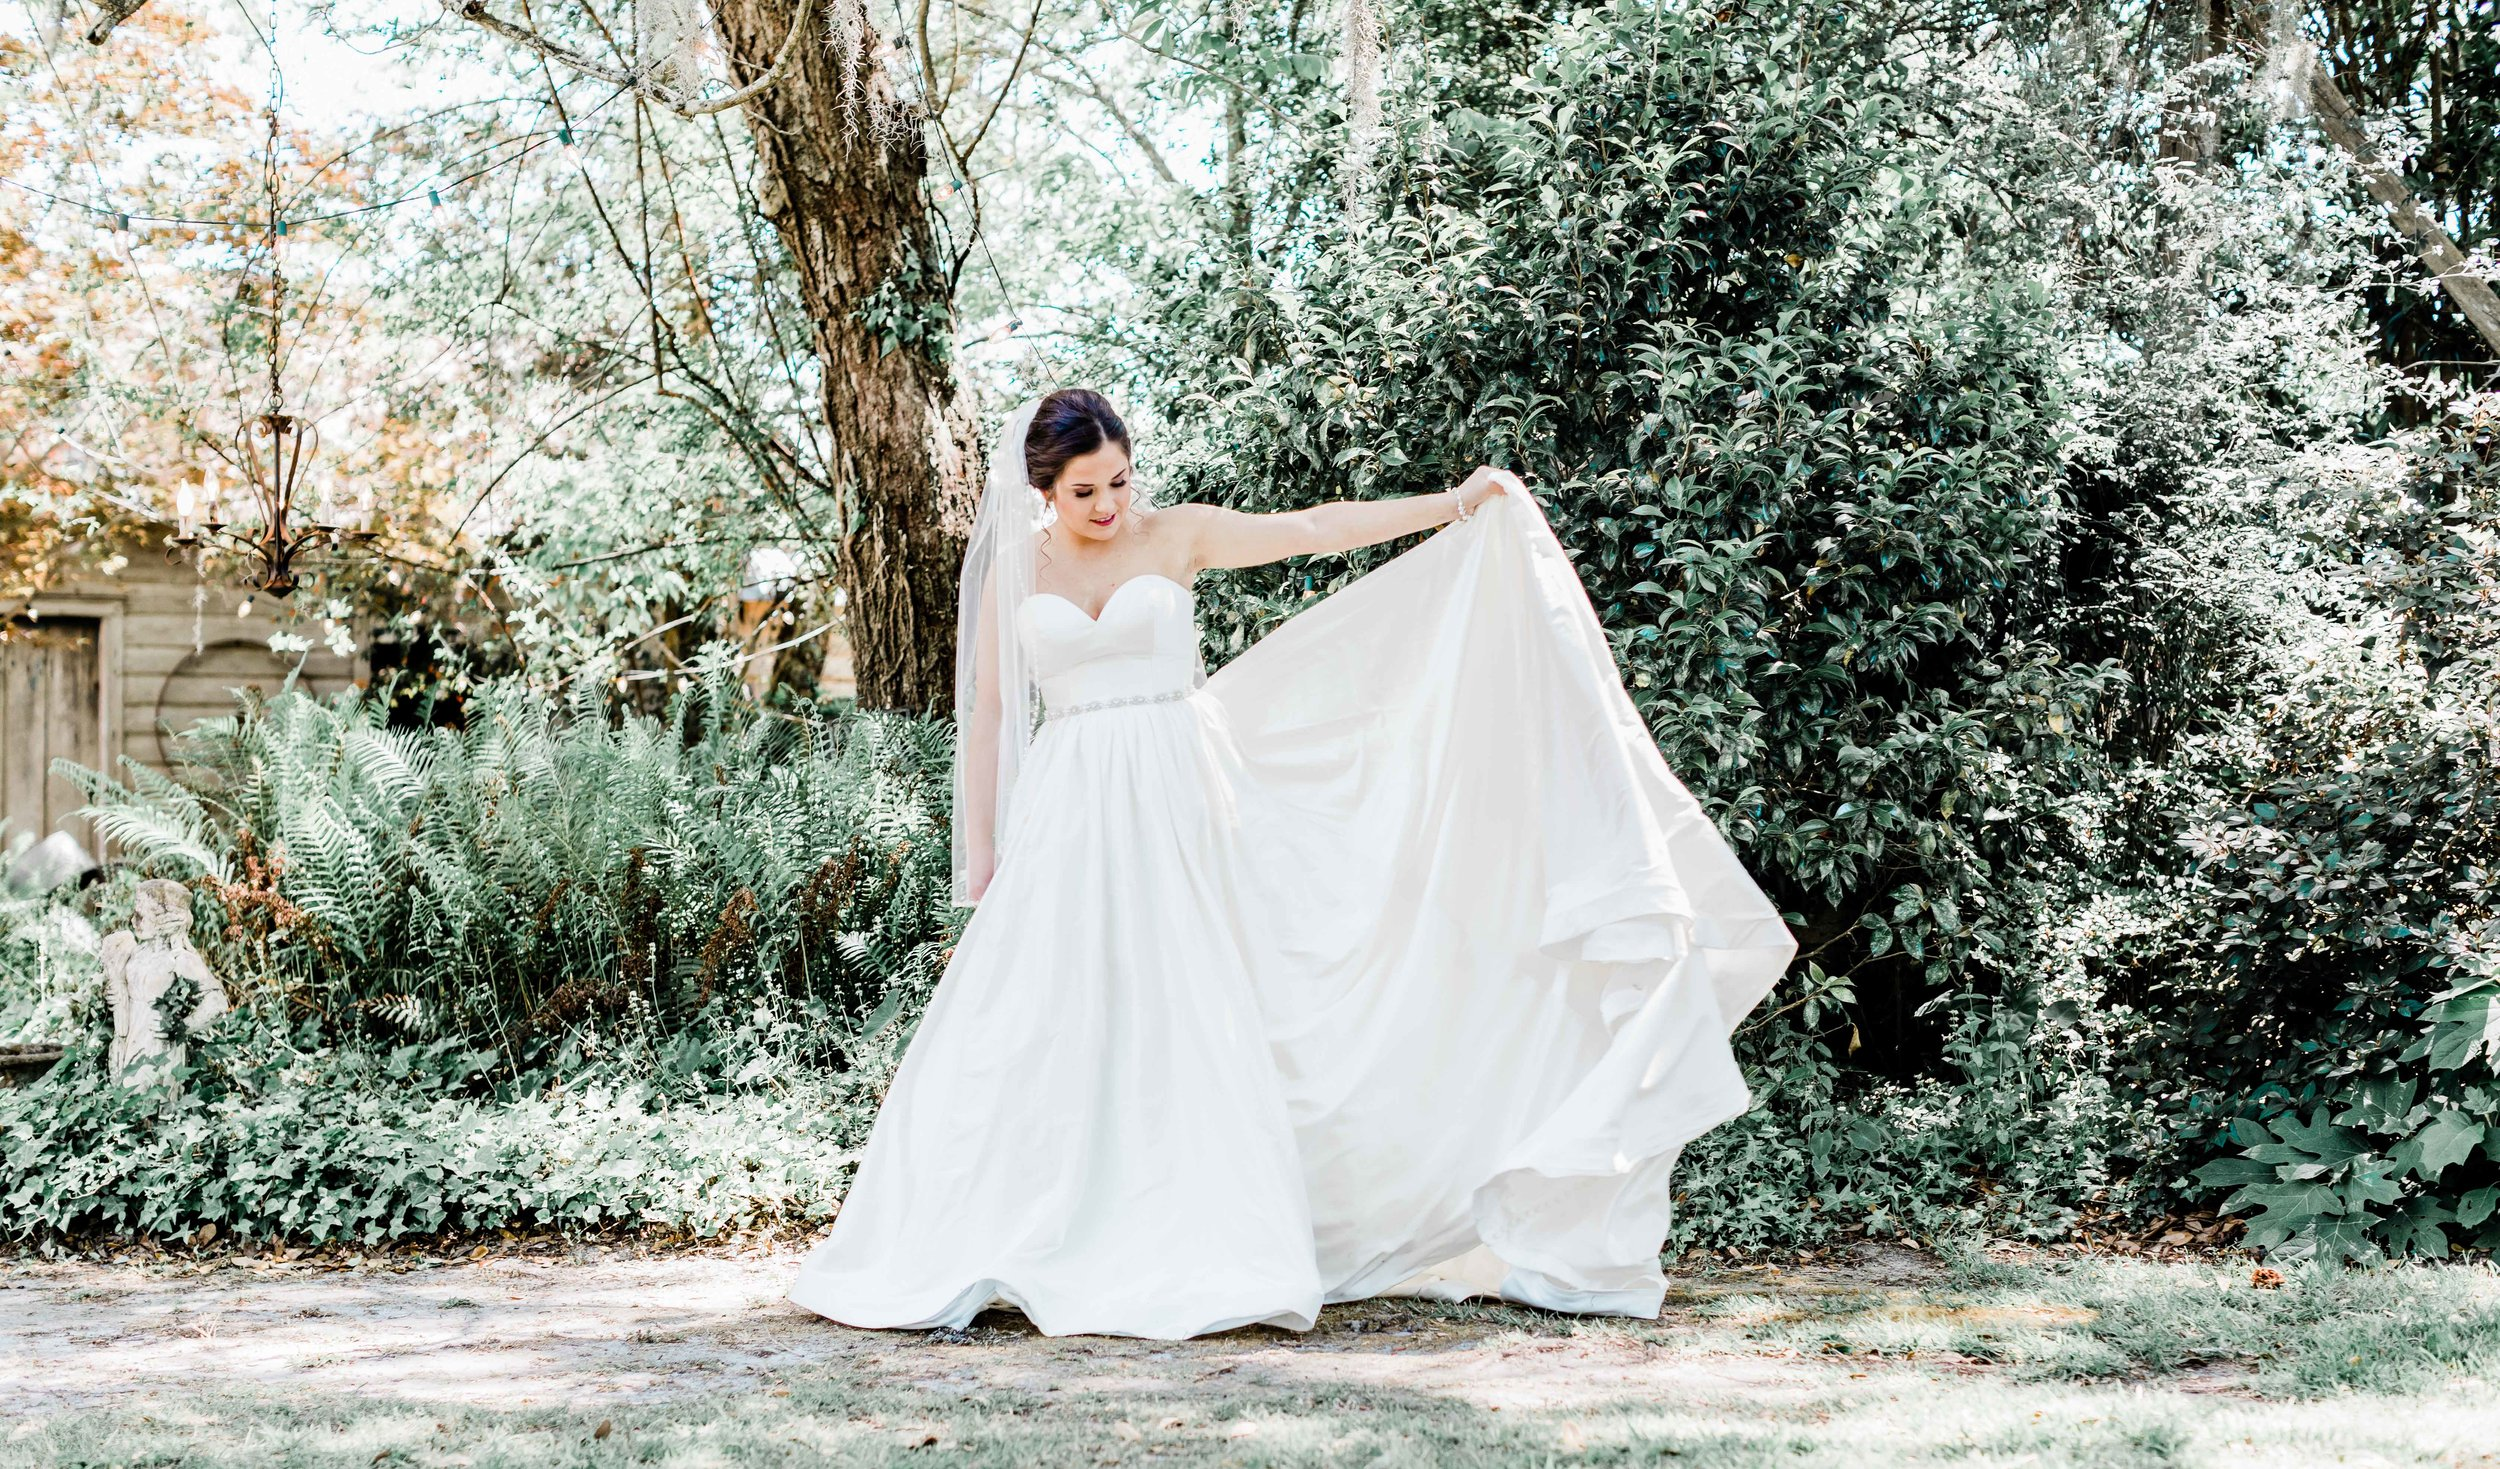 20190427-Southern Lens Photography- Savannah Wedding Photographer-Screven and Caroline-201942.jpg